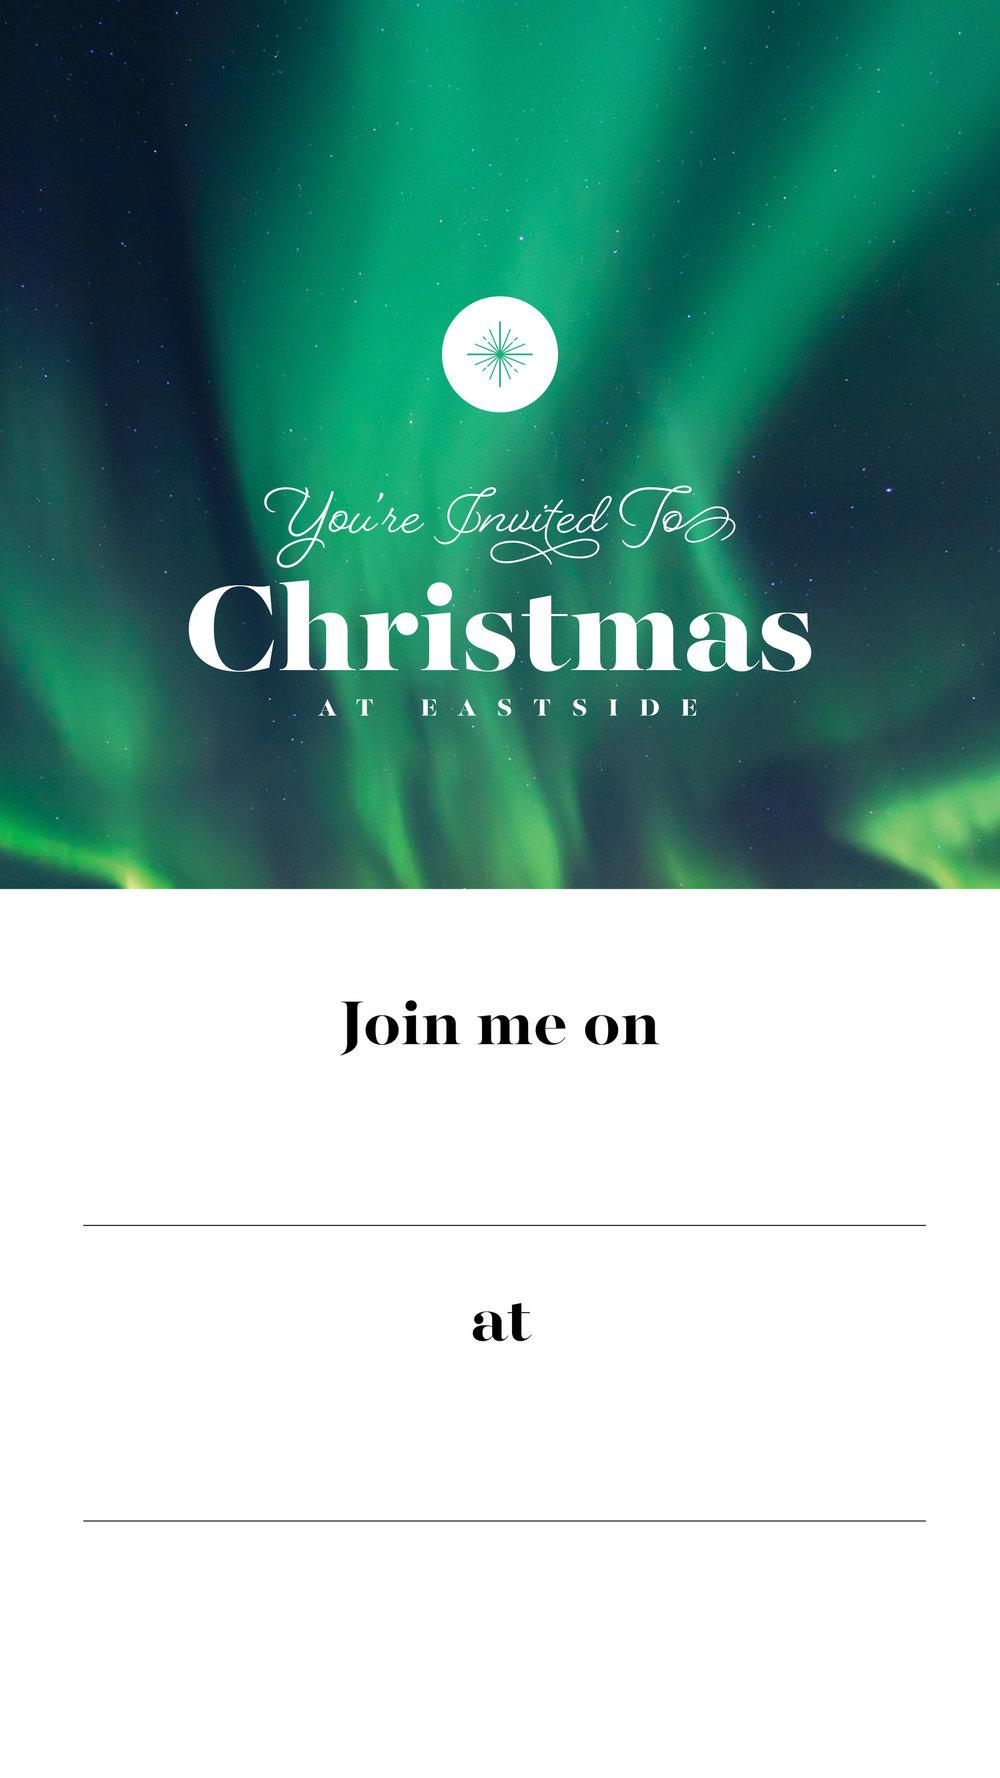 ChristmasAtEastsideInstaStory9.jpg